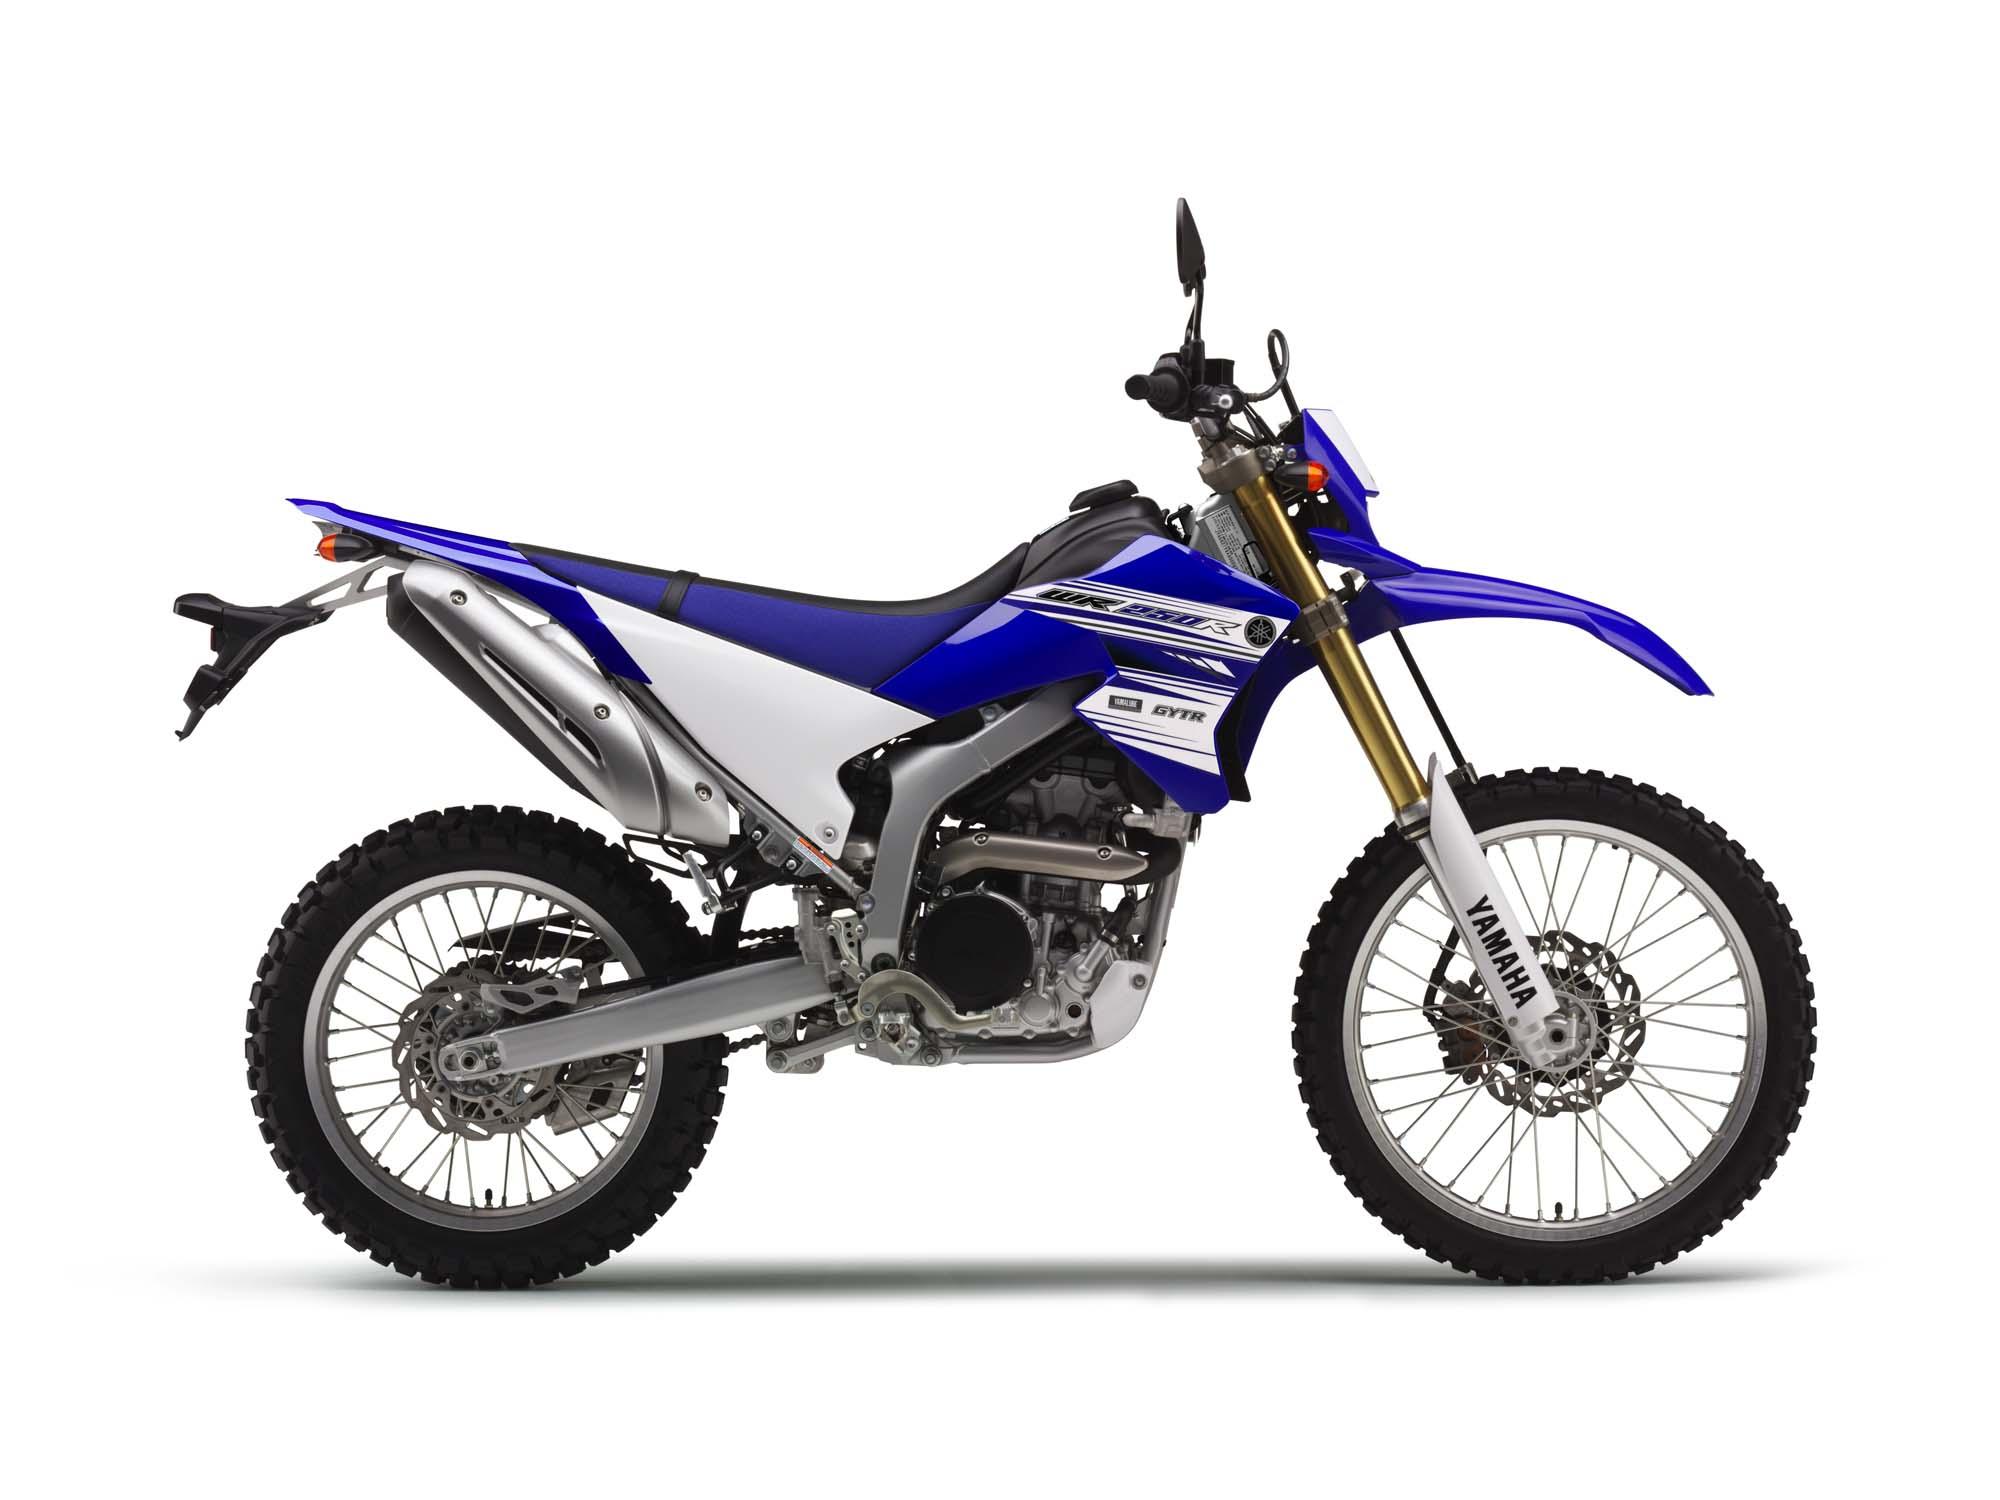 Yamaha TZR 50ccm / 5.94kW kaufen auf Ricardo